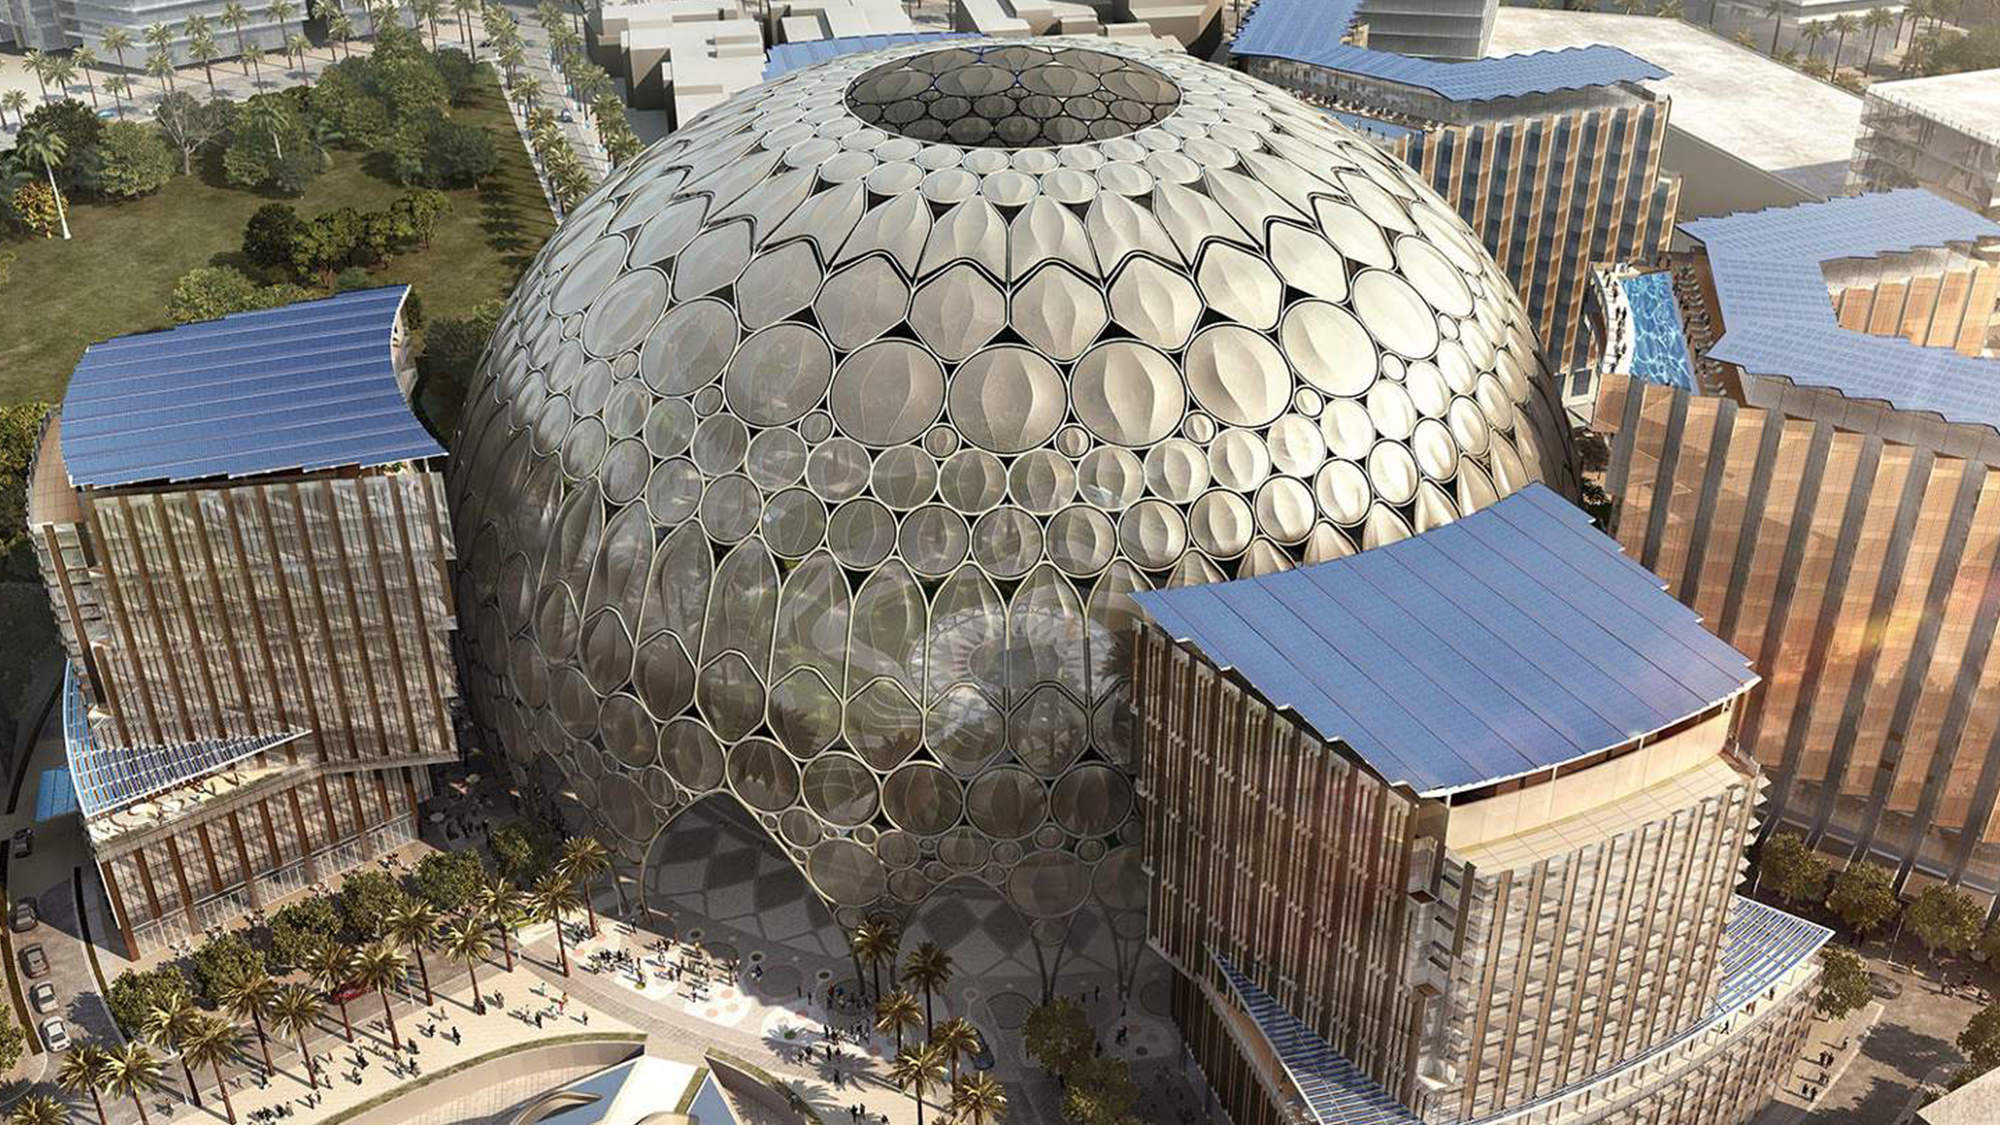 al-wasl-trellis-expo-2020-project-image